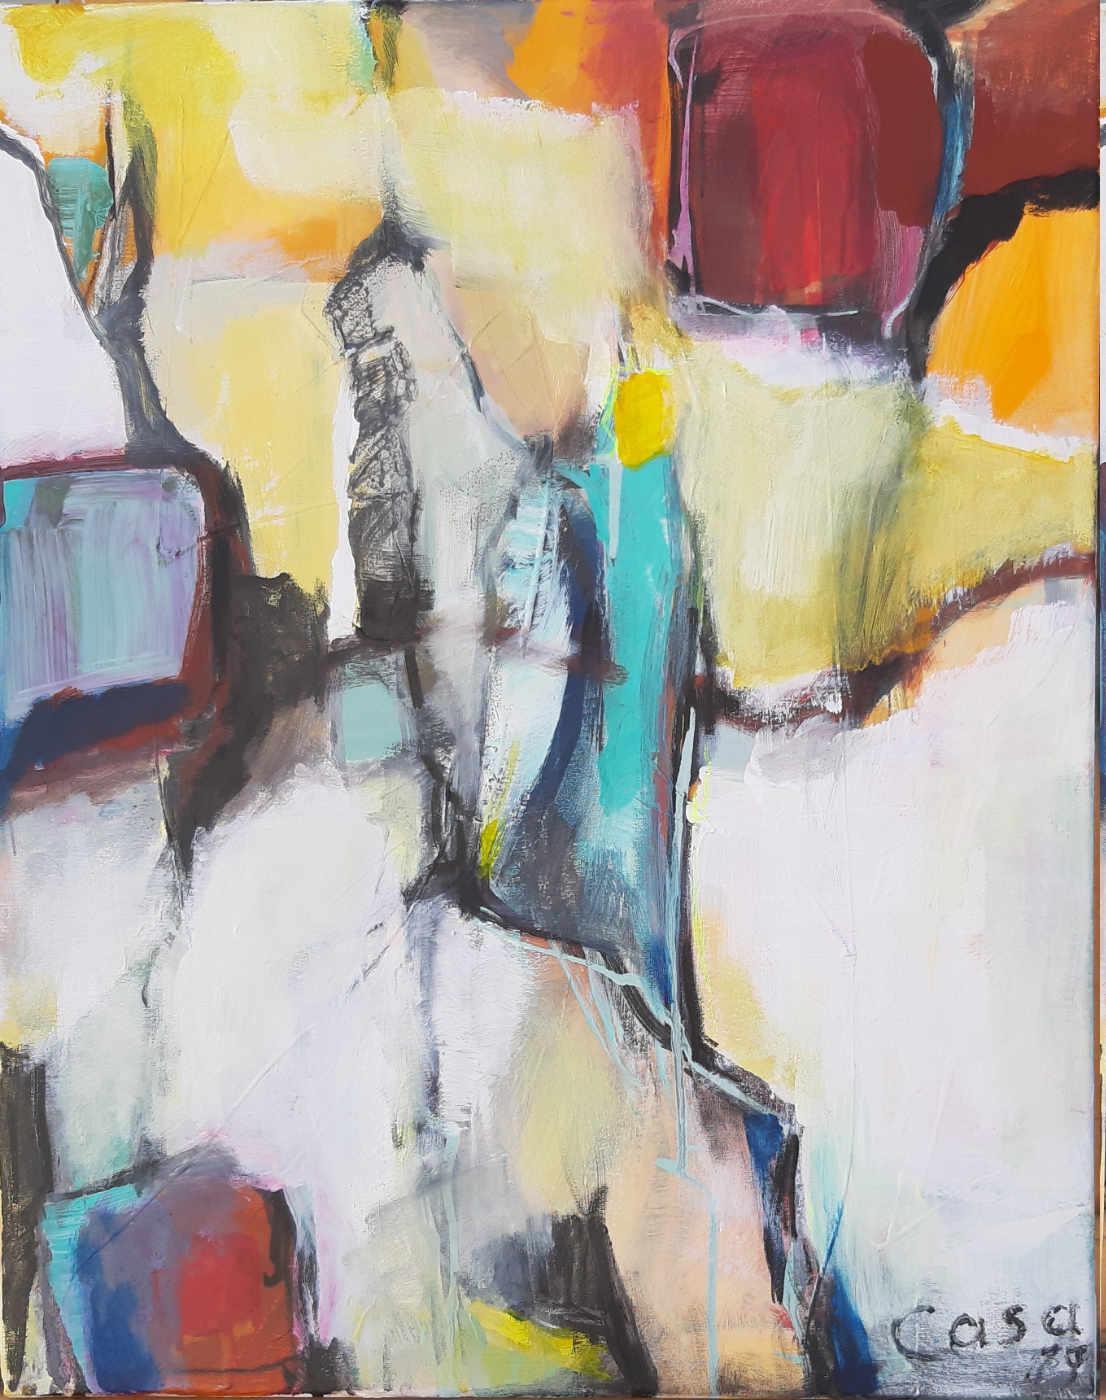 ohne Titel - Acryl auf Leinwand, 50 x 40 cm